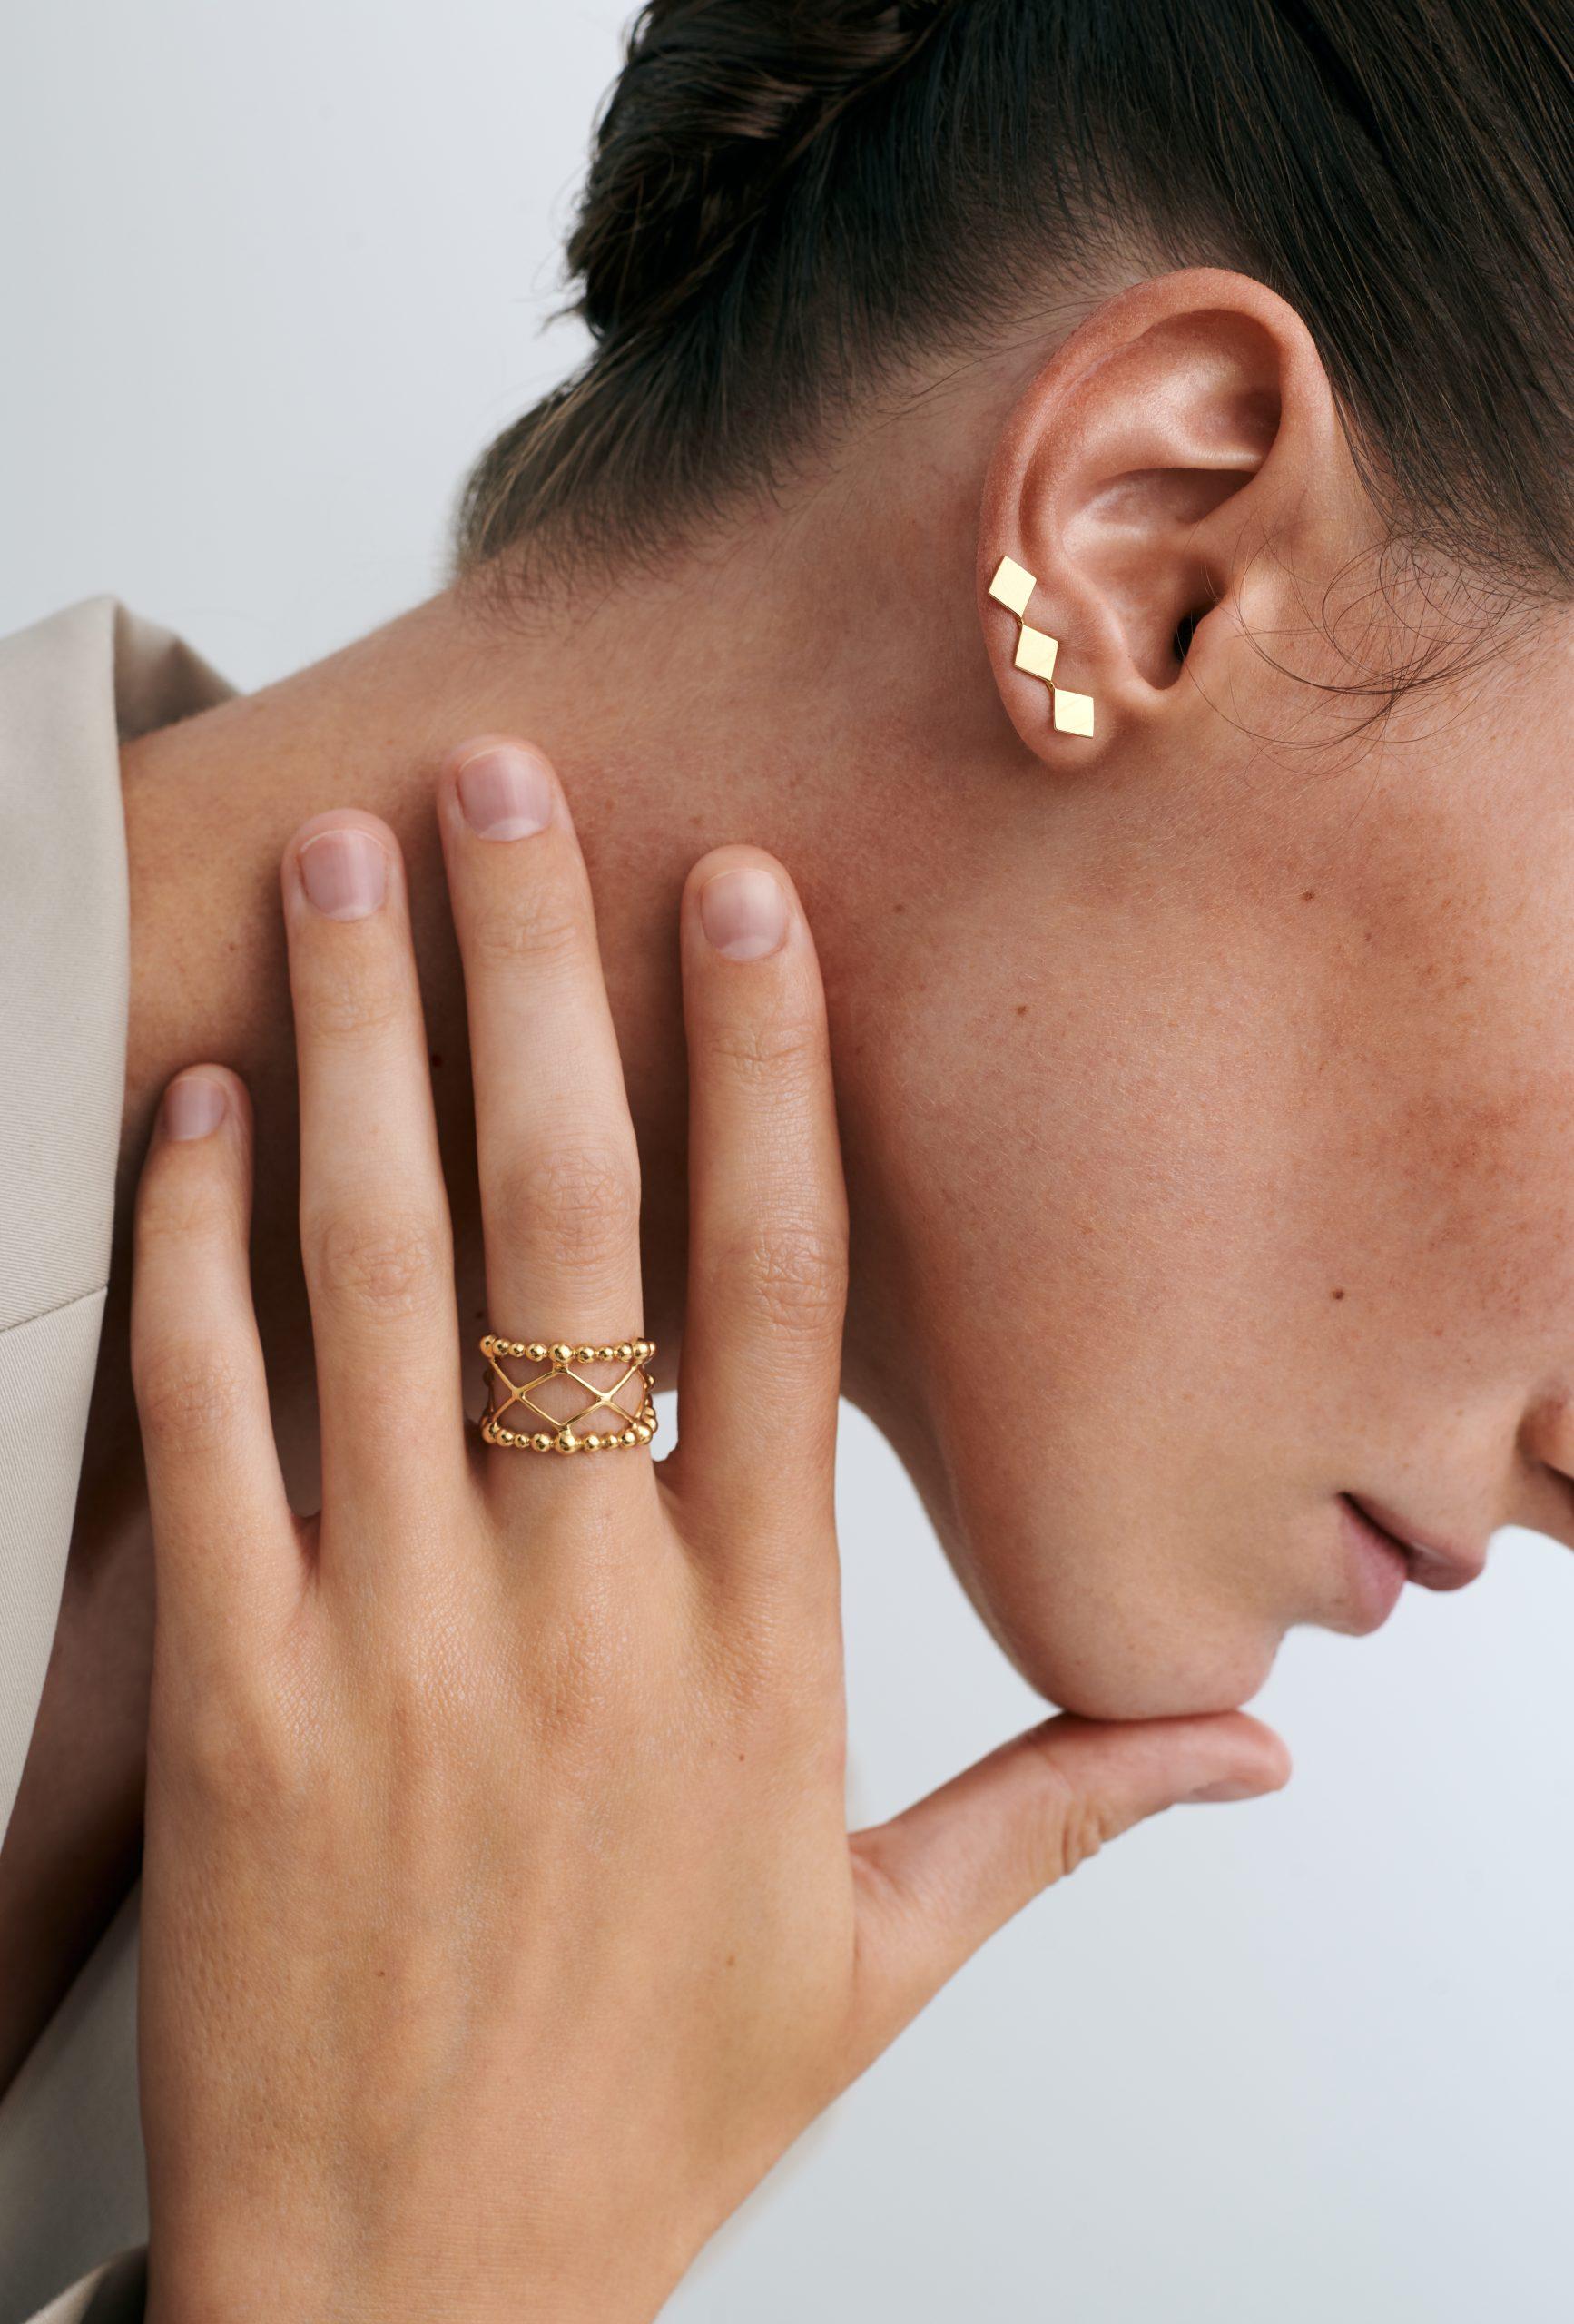 Guzema Jewelry и Gunia Project представили коллаборацию, посвященную современным украинкам